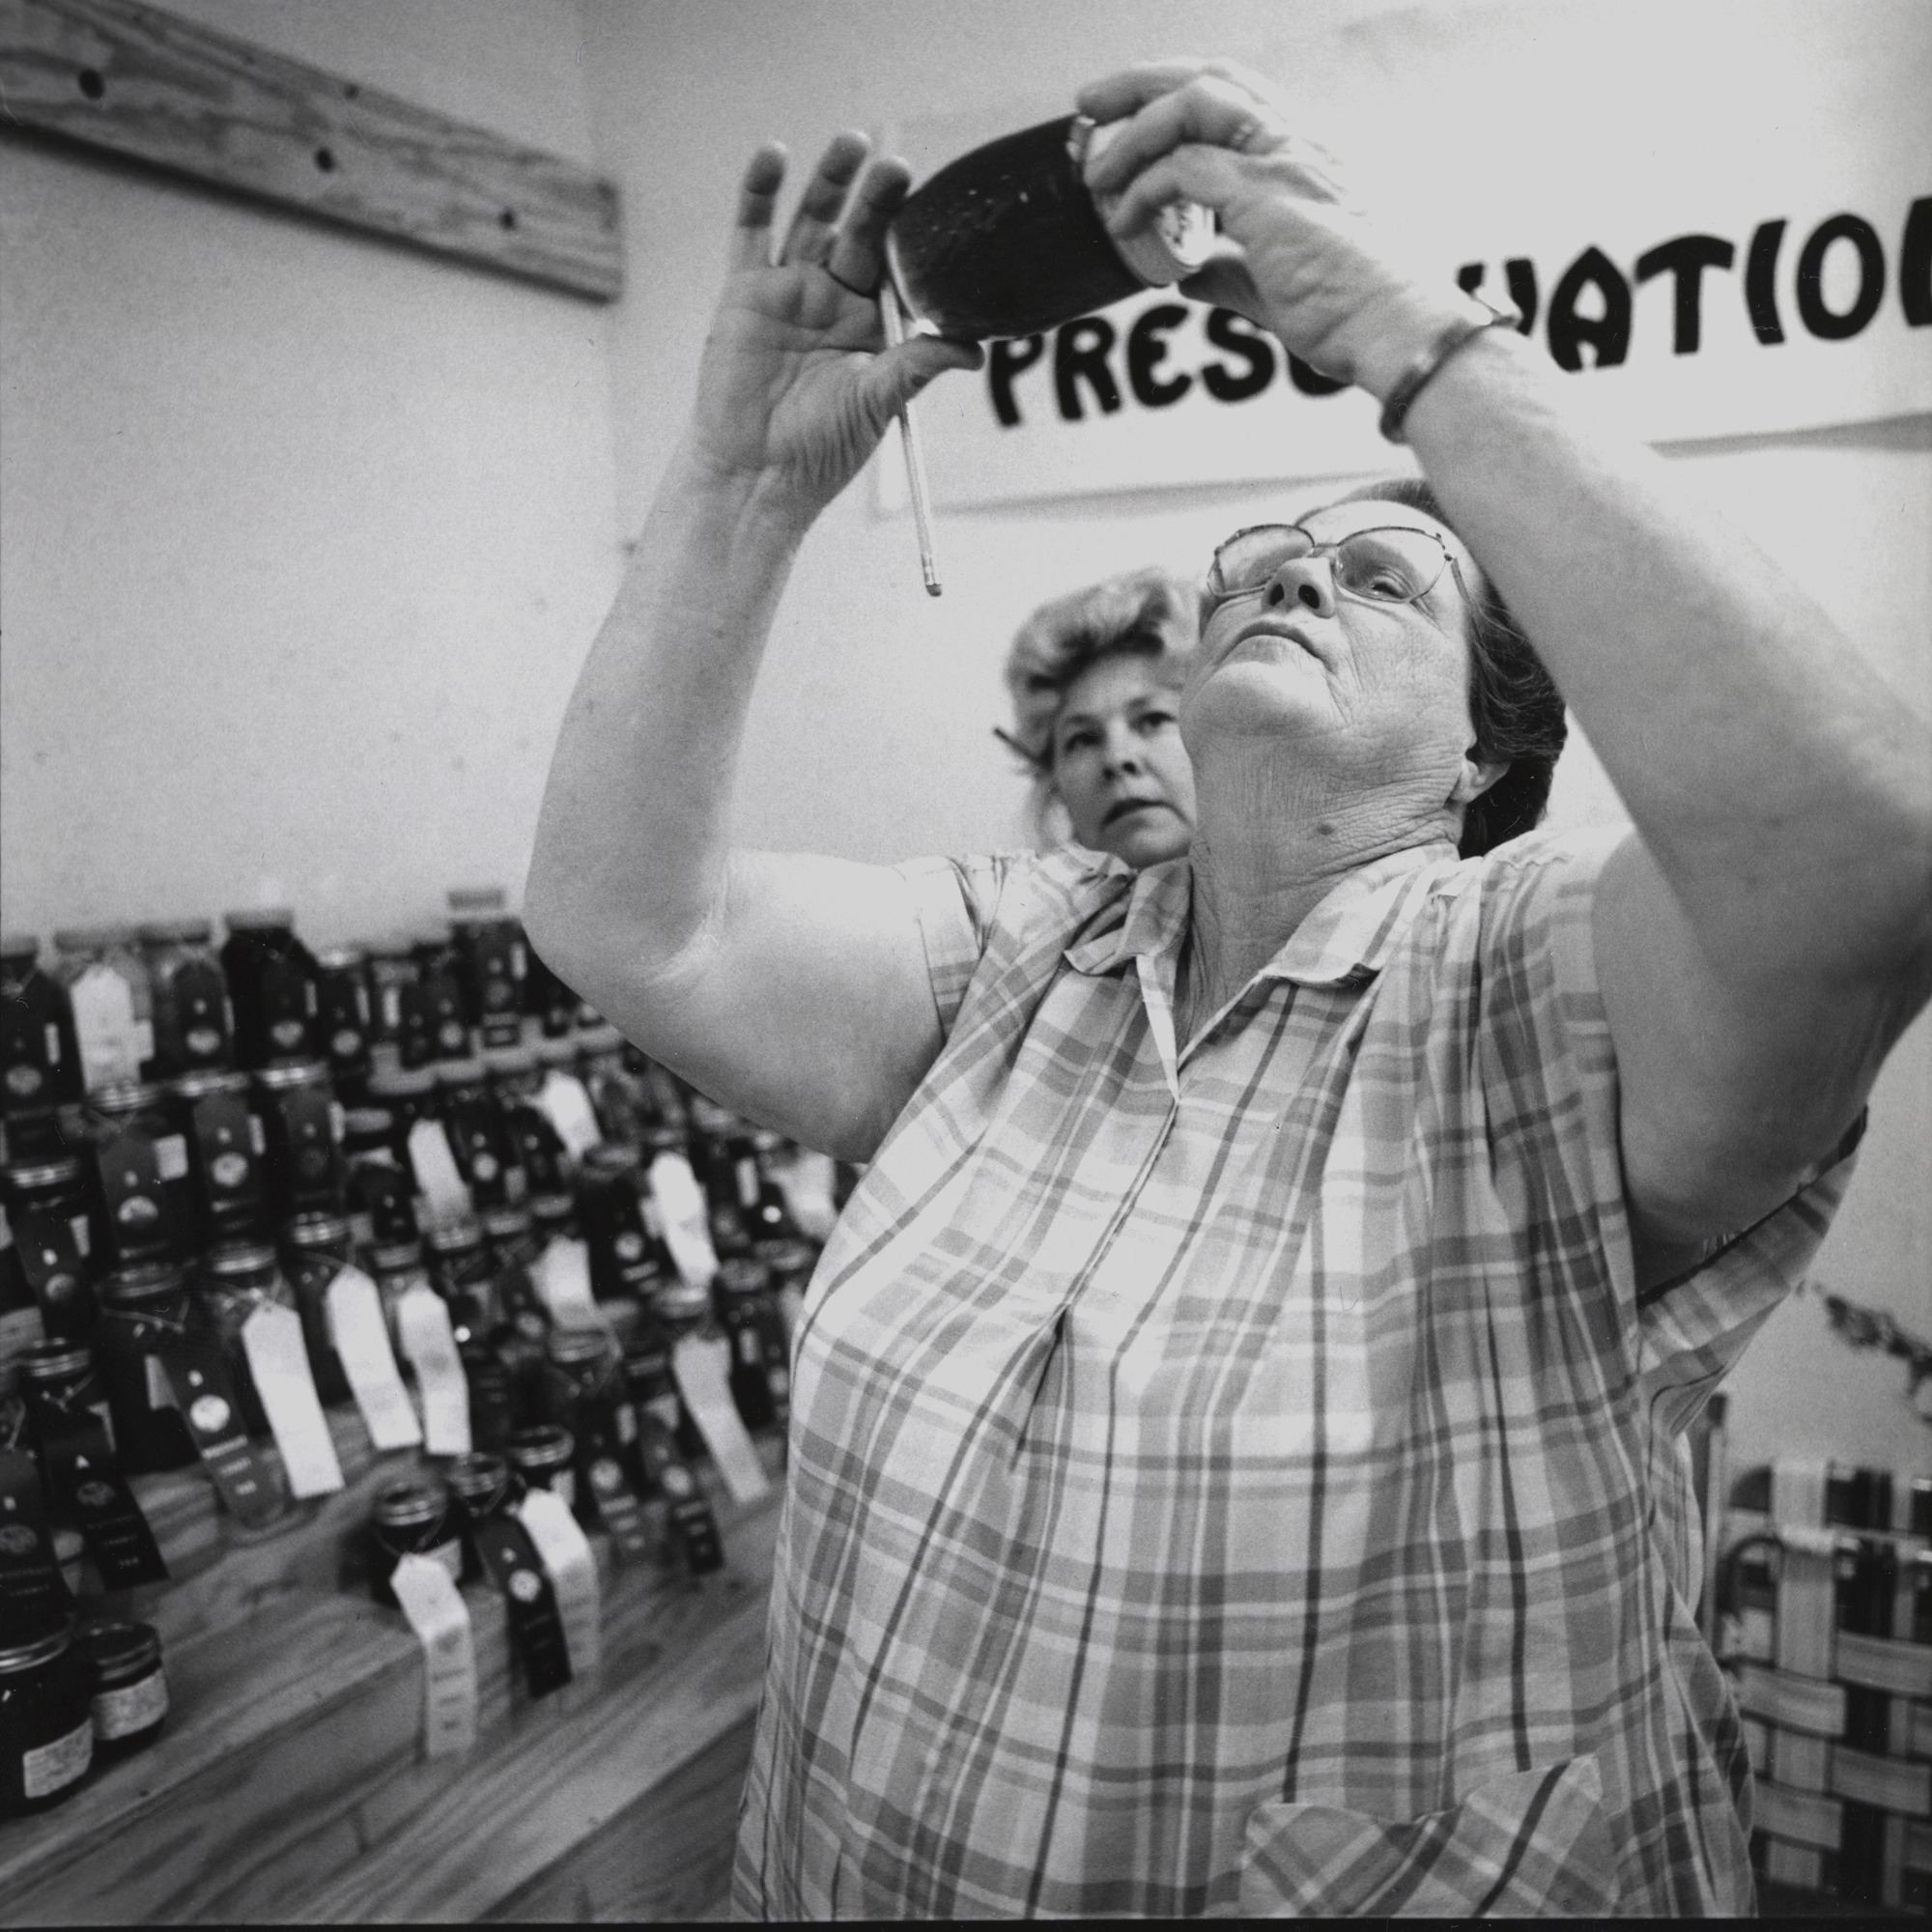 Women Judging Jam, McCrory, Arkansas, archival pigment print, 16x20, 1990